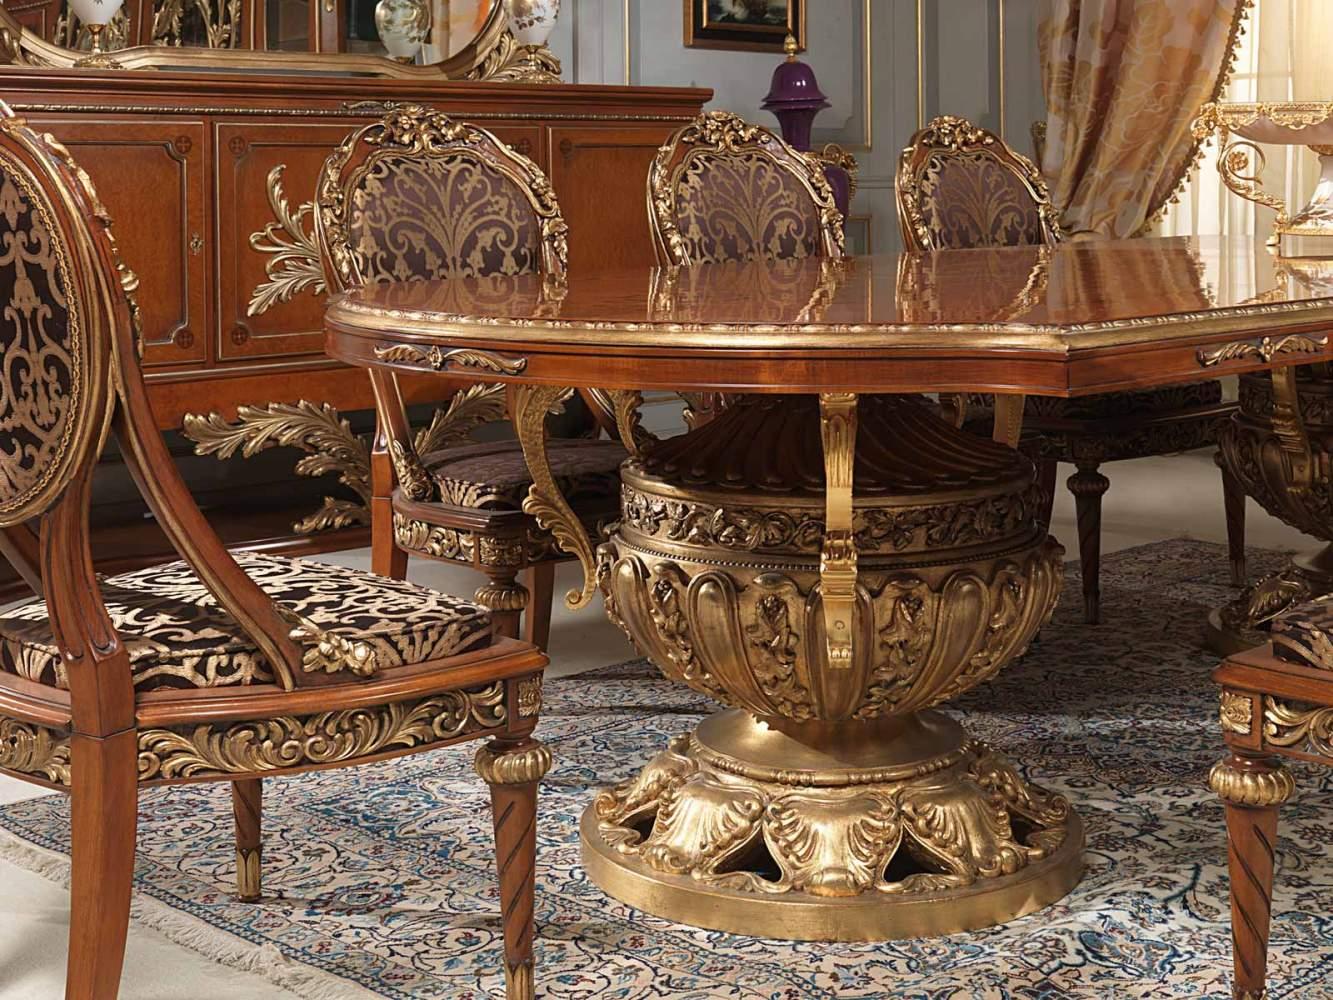 Tavolo e sedie Versailles in stile Luigi XVI